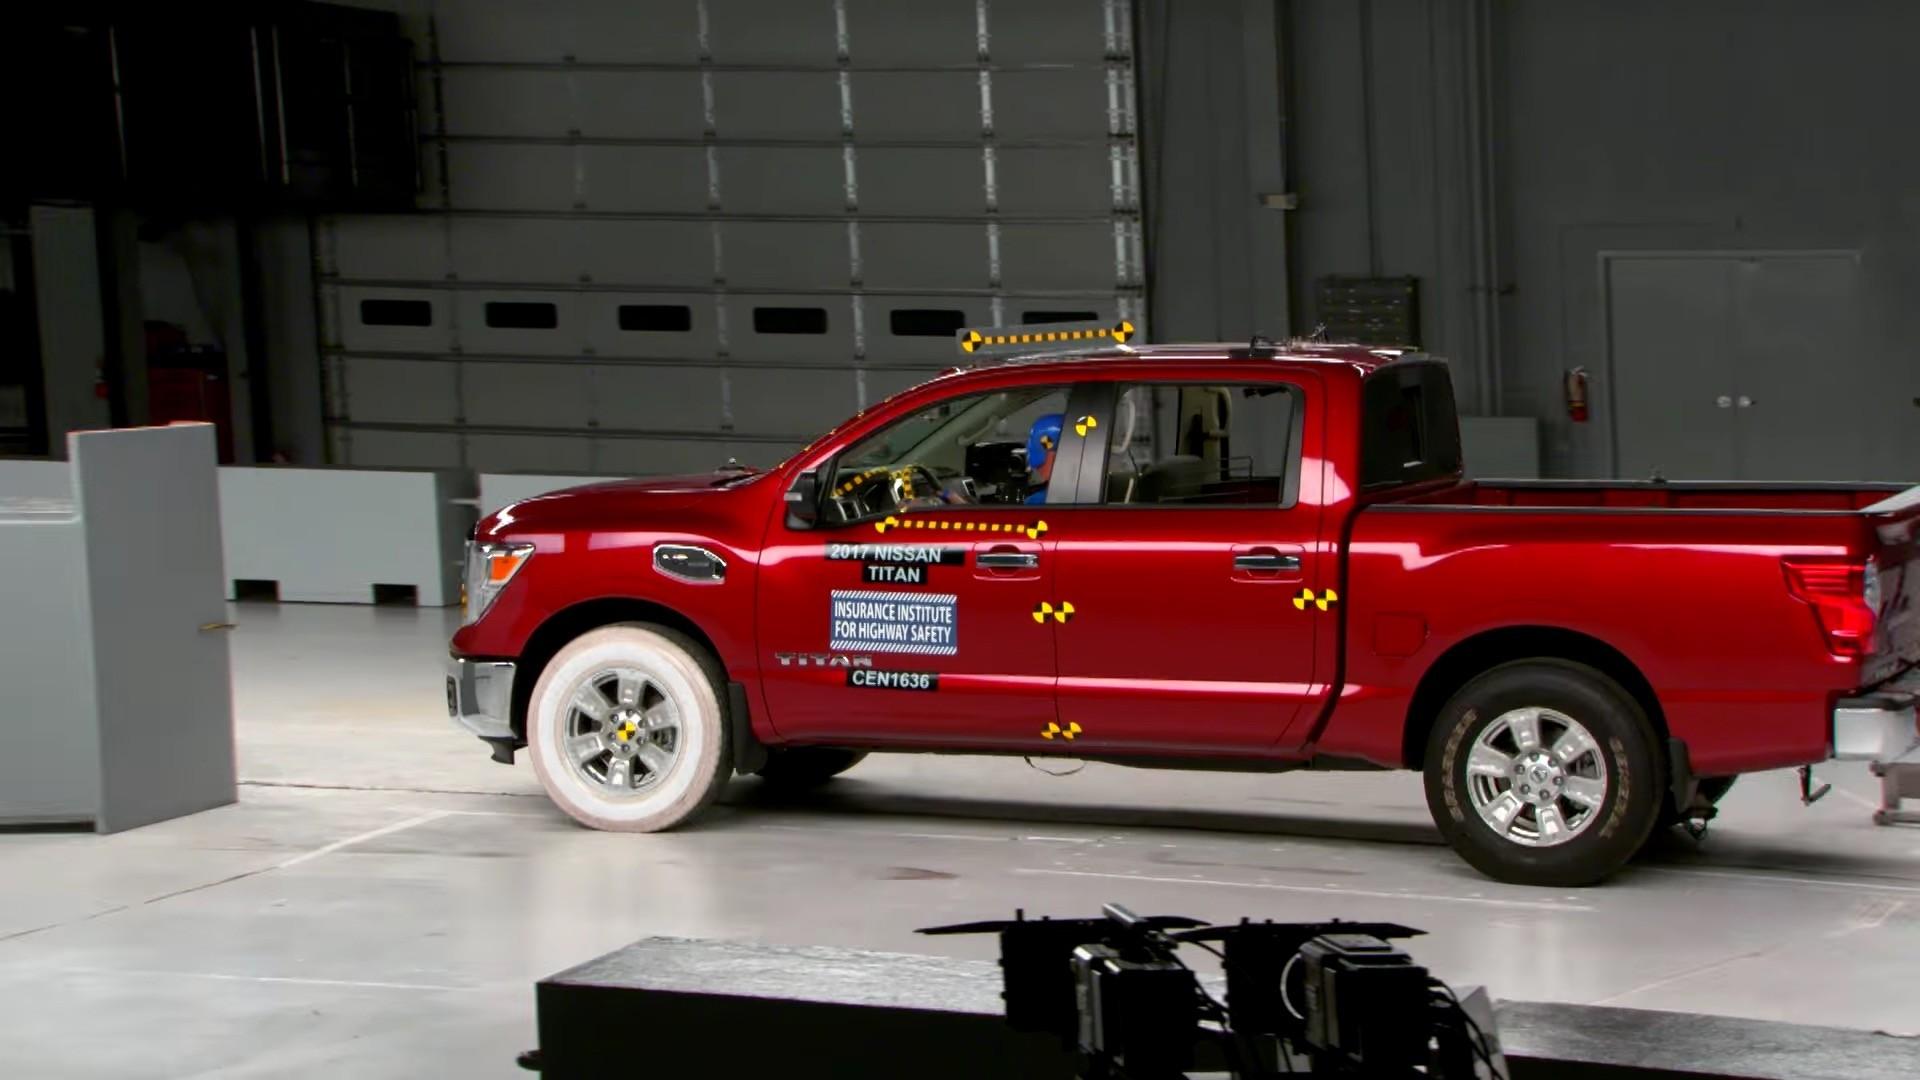 2017 nissan titan crew cab rated marginal in small overlap iihs crash test autoevolution. Black Bedroom Furniture Sets. Home Design Ideas